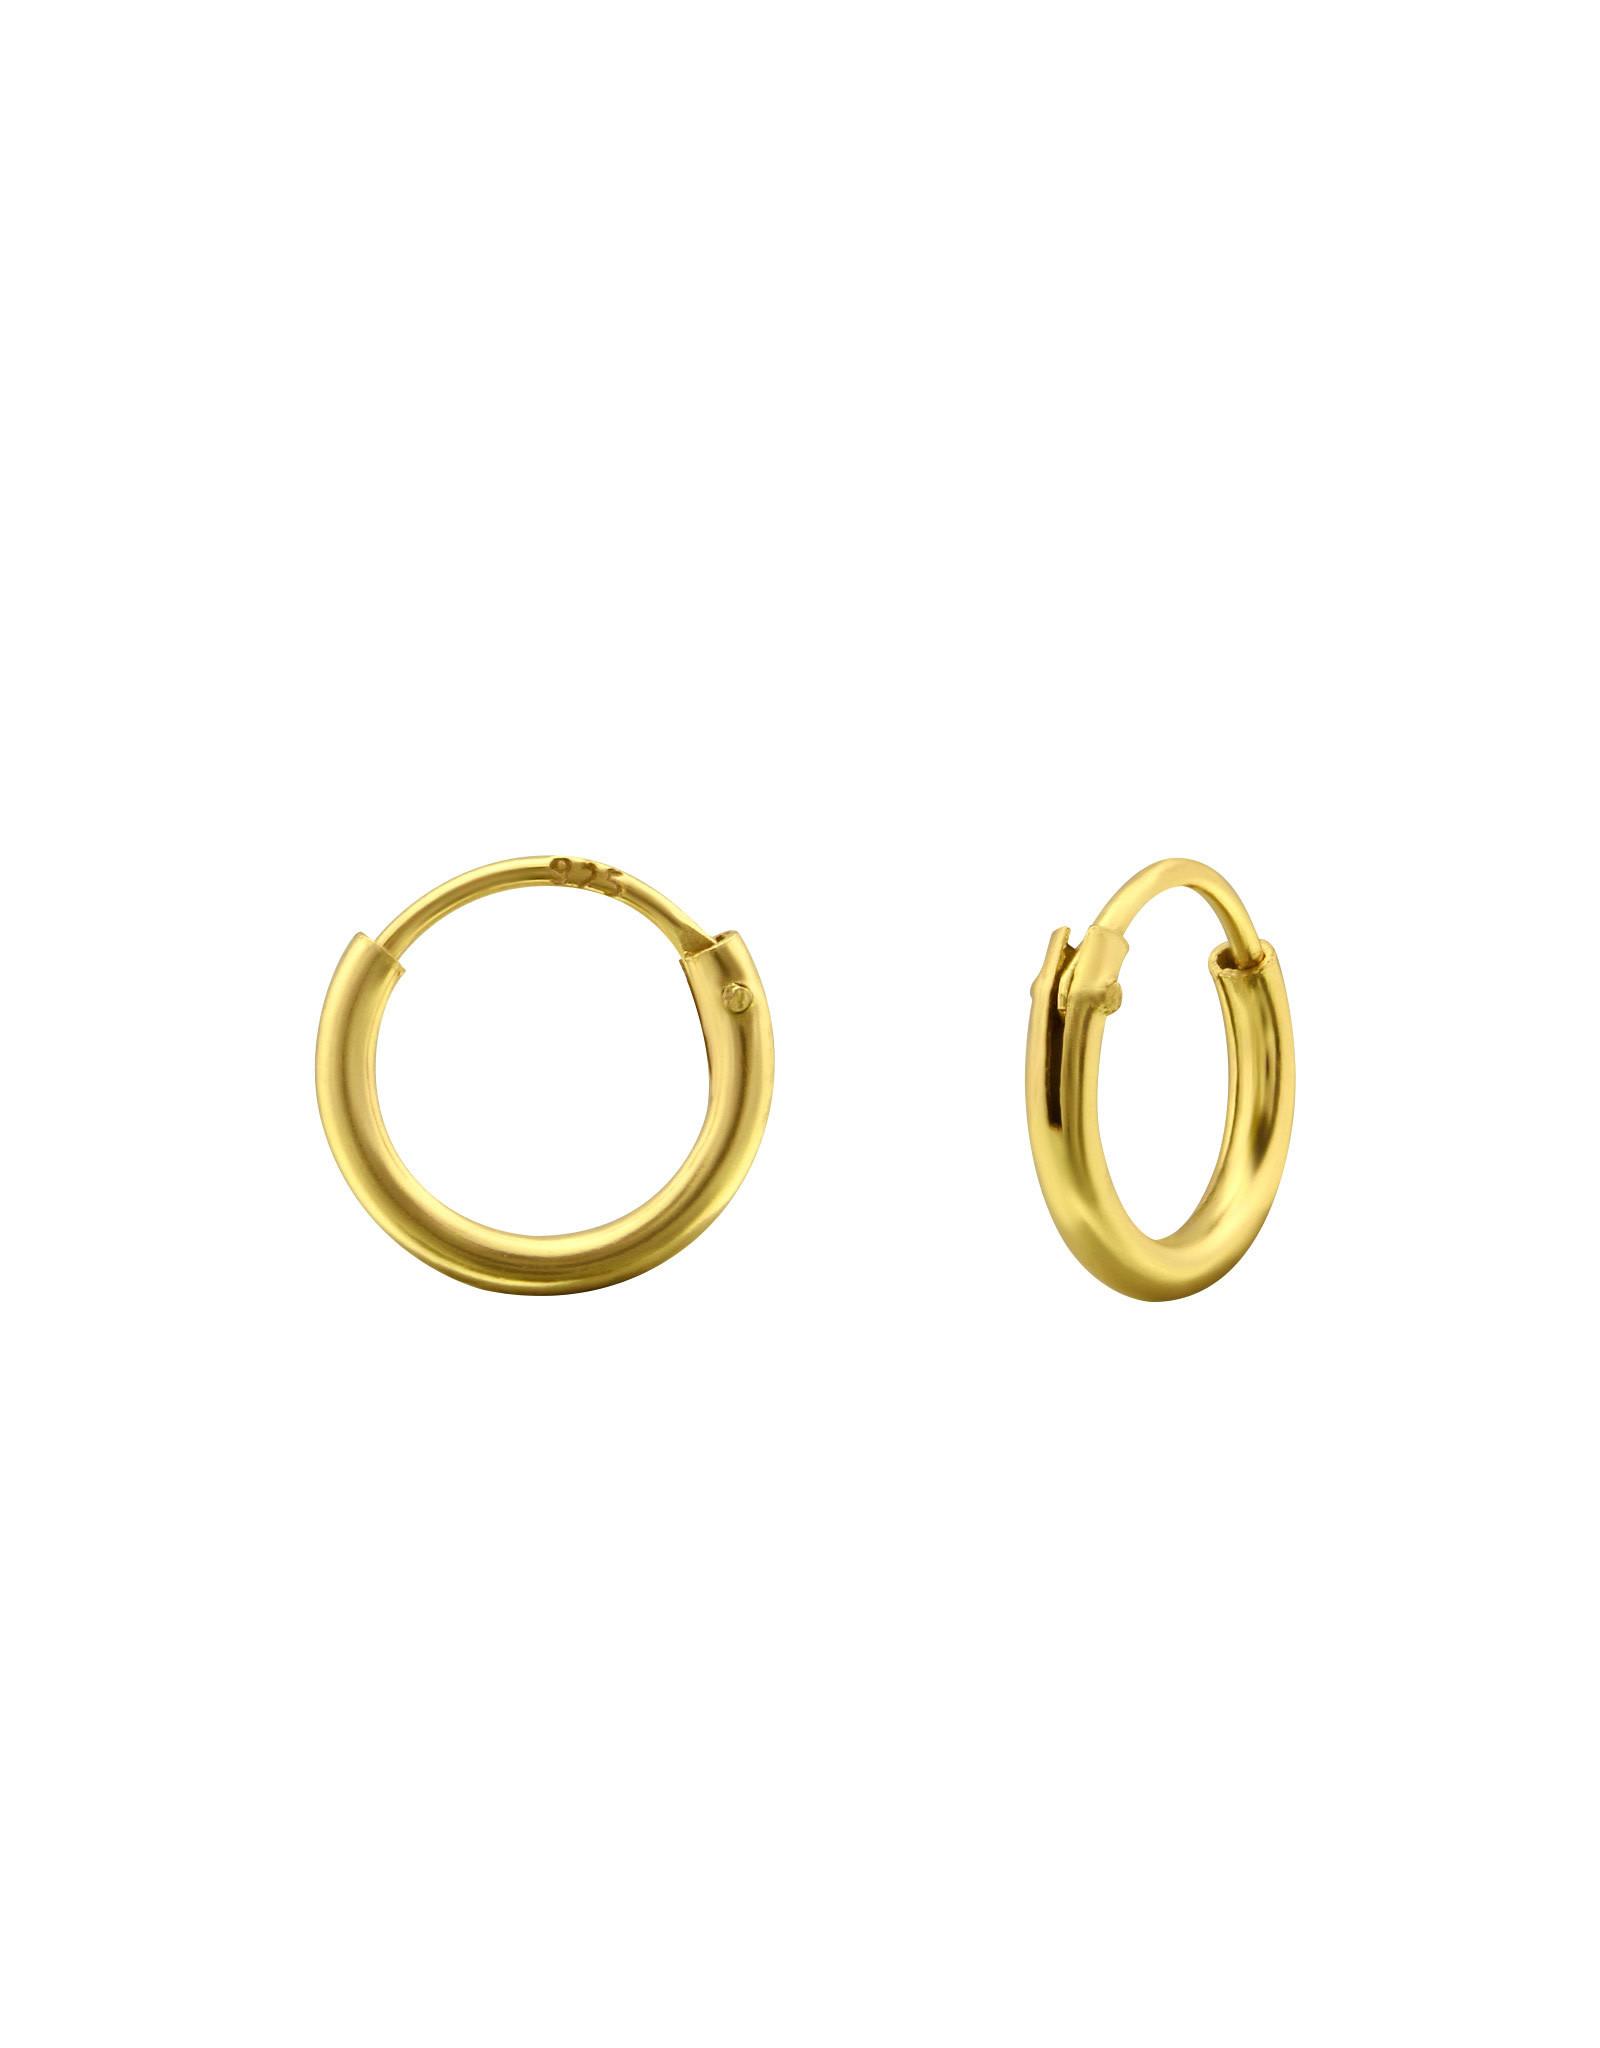 Ringetjes verguld 8mm